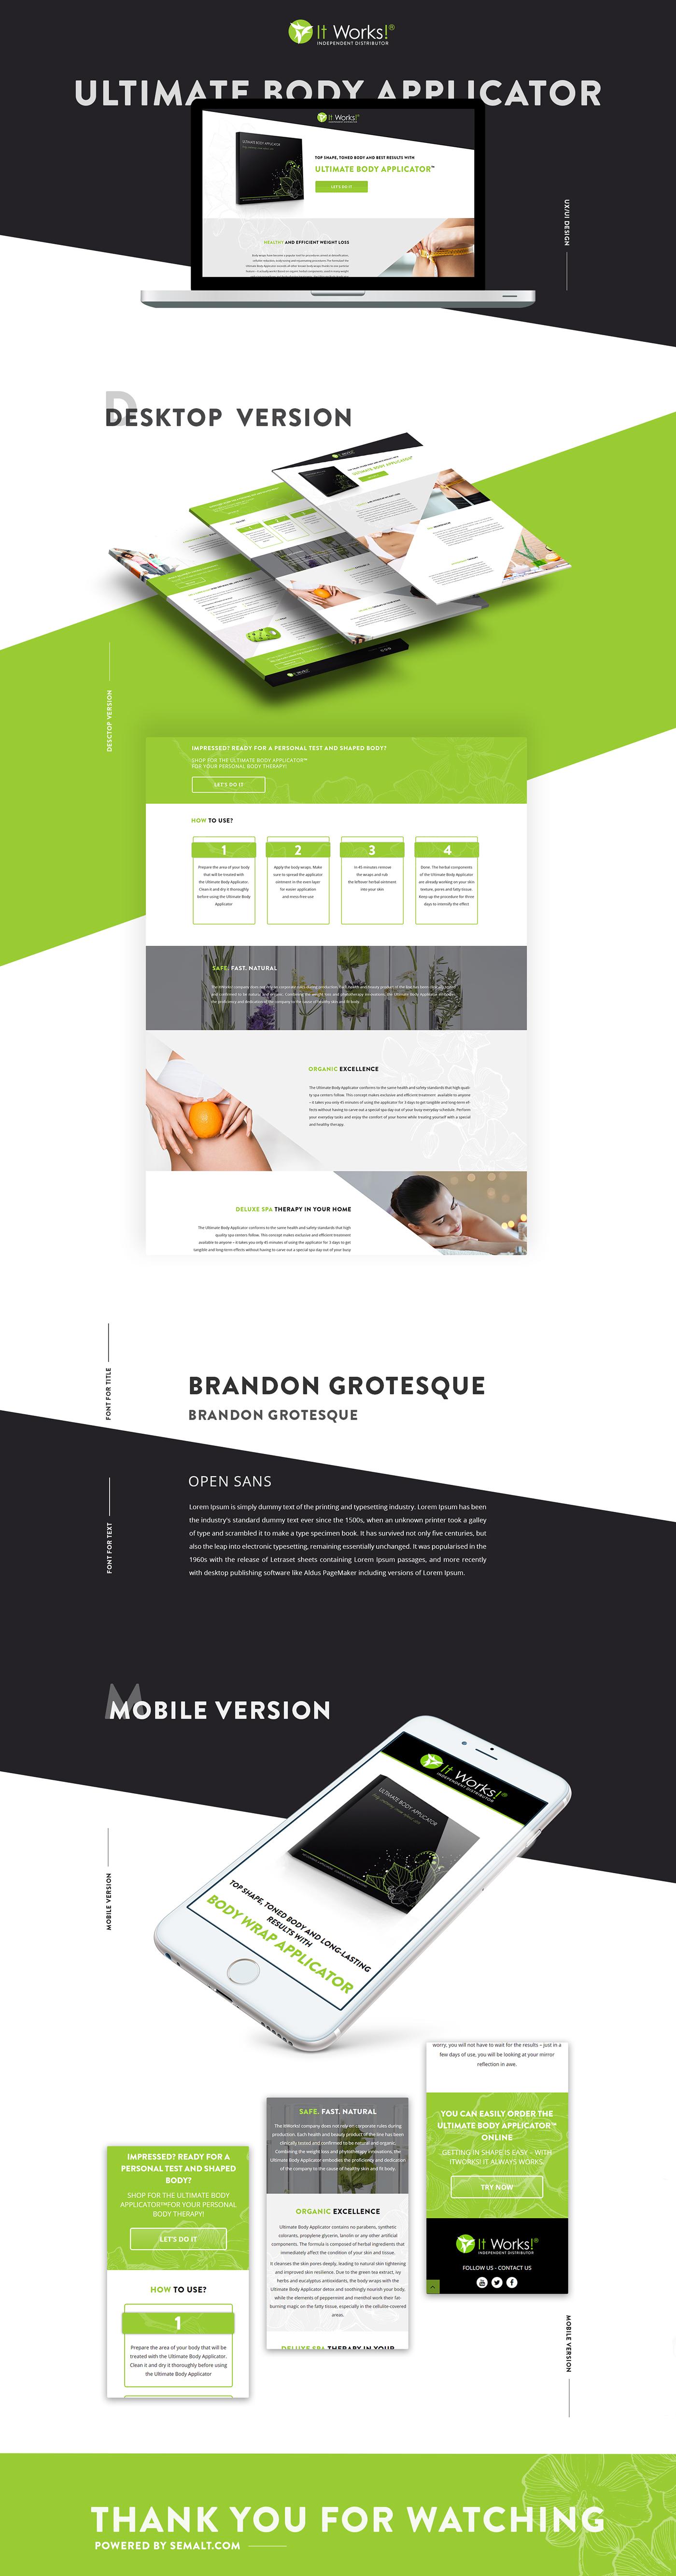 design Webdesign portfolio typography   site photoshop Web development SEO landing